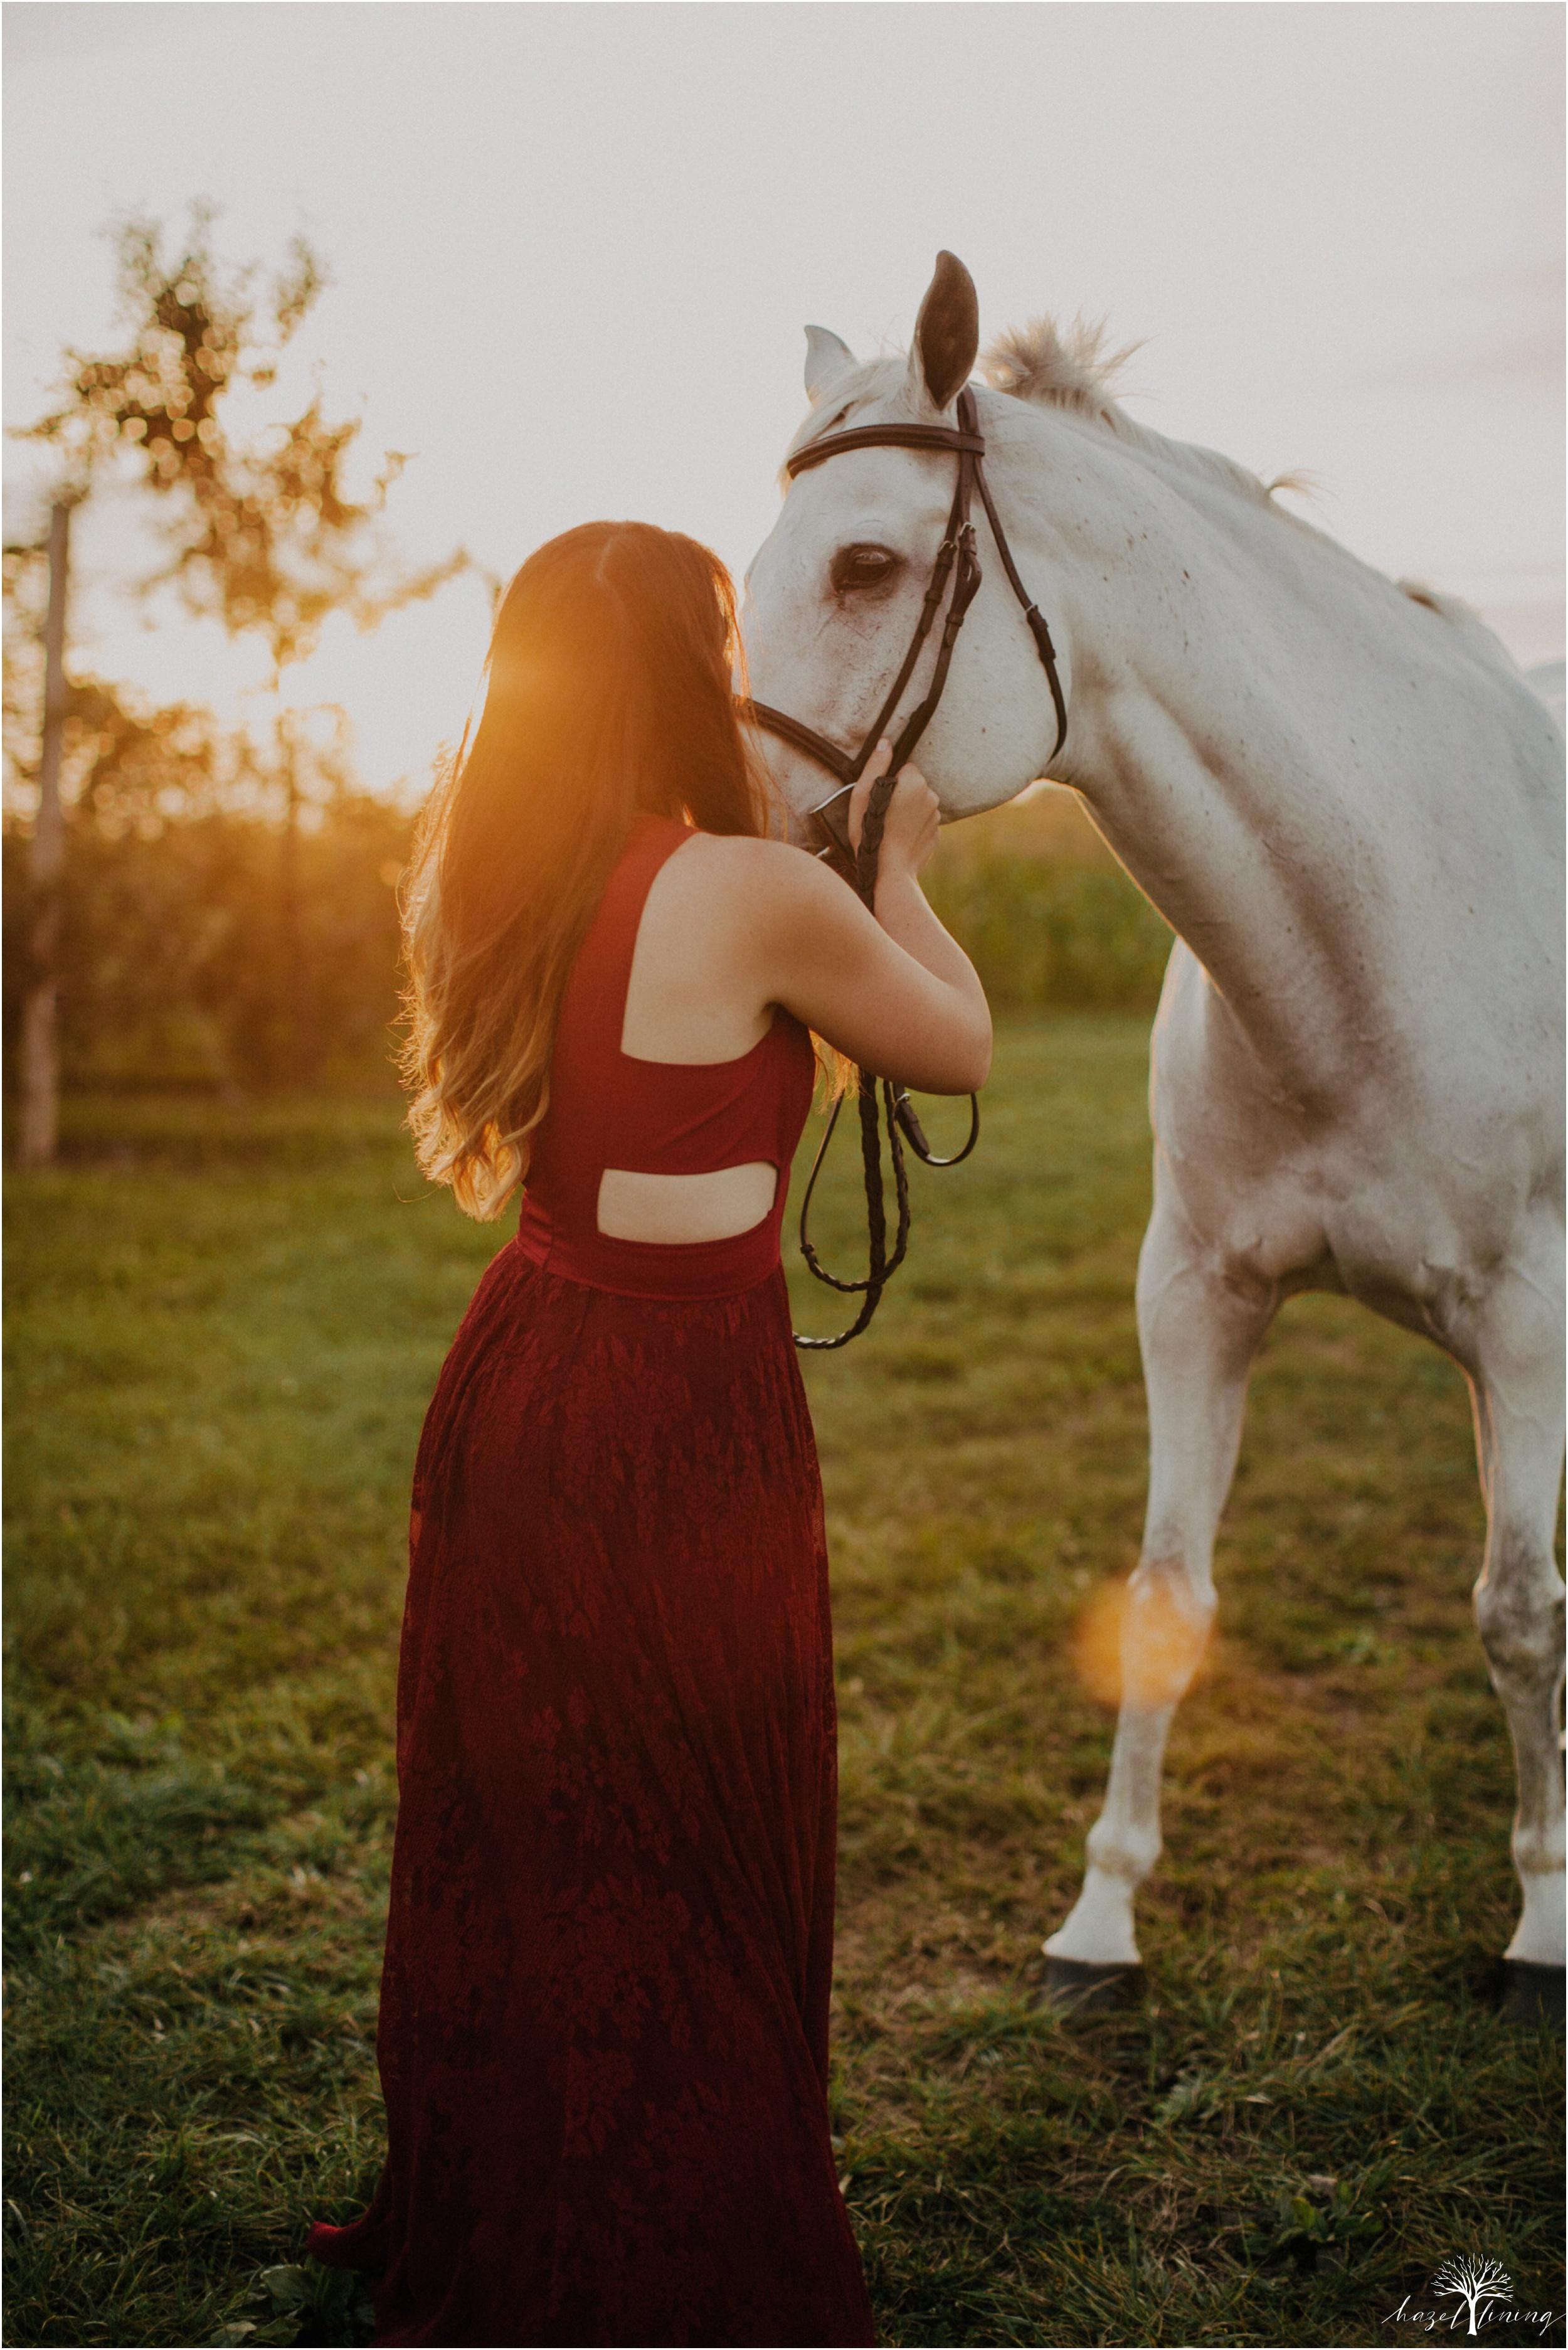 taylor-adams-and-horse-delaware-valley-university-delval-summer-equestrian-portrait-session-hazel-lining-photography-destination-elopement-wedding-engagement-photography_0068.jpg